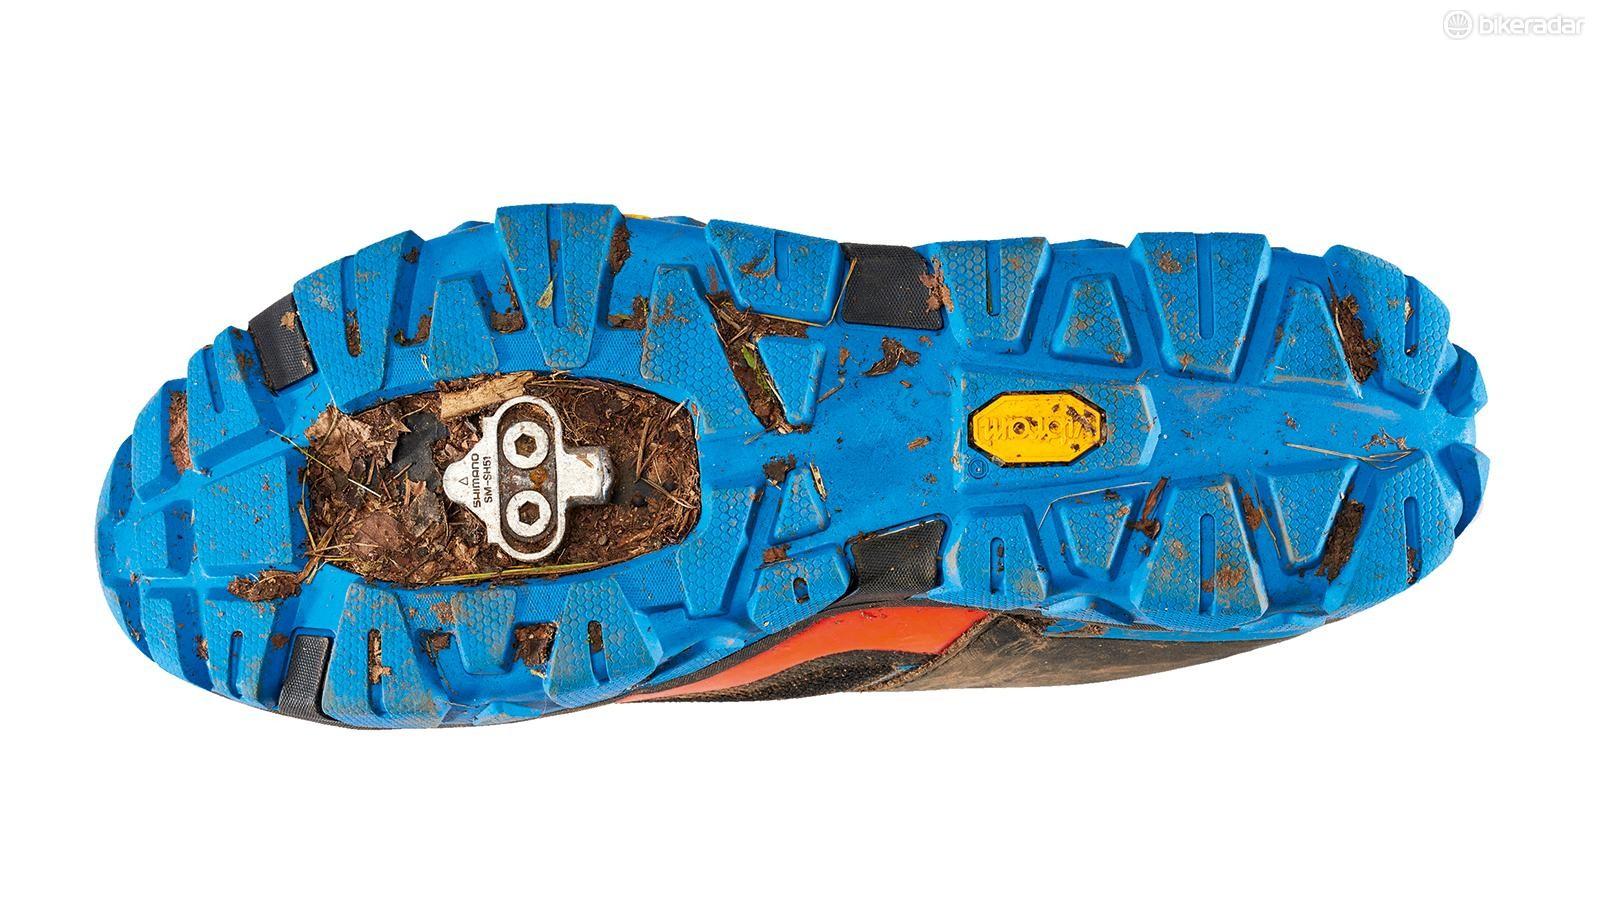 f057c628 Cube All Mountain Pro shoe review - BikeRadar